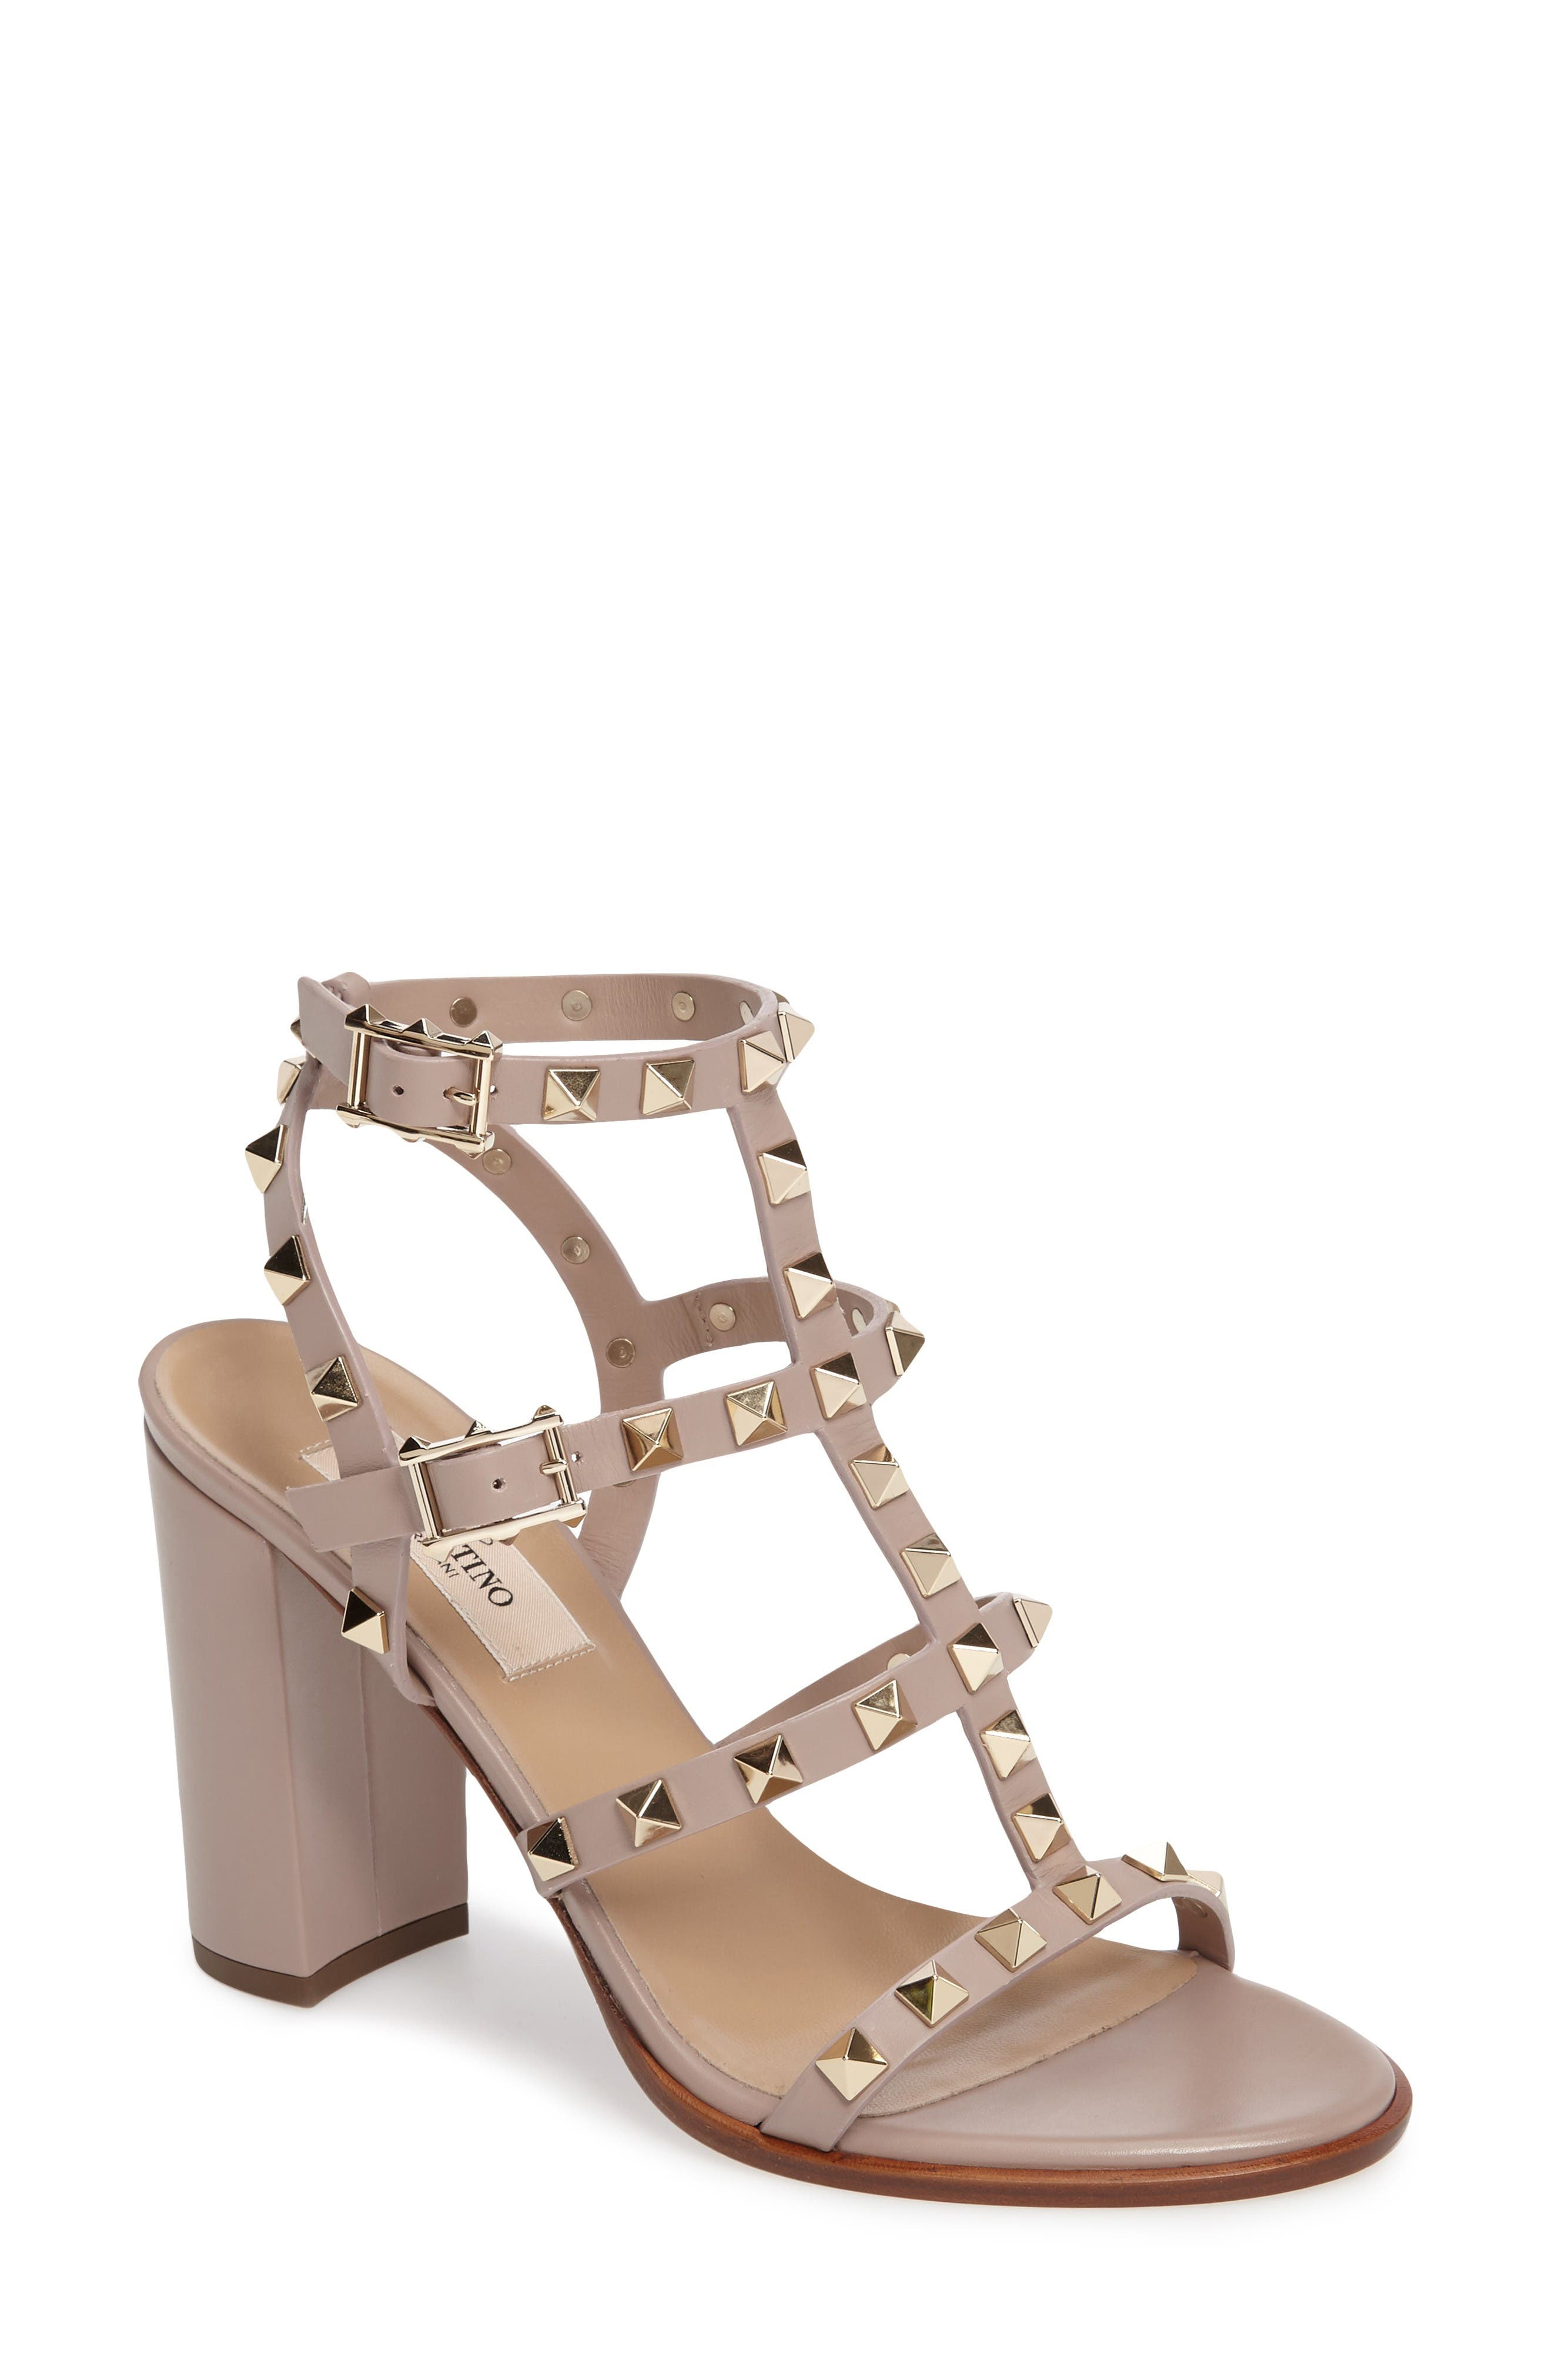 Main Image - VALENTINO GARAVANI 'Rockstud' T-Strap Sandal (Women)